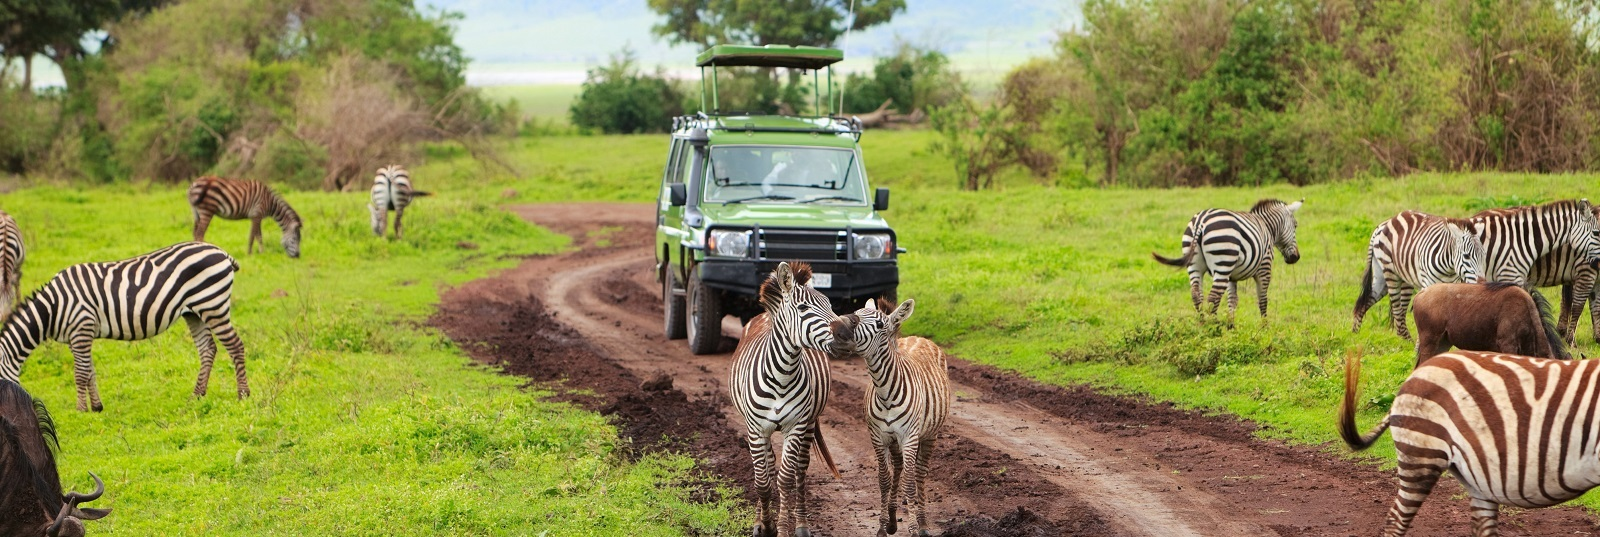 itripcoltd-Tanzania-Tours-Ngorongoro-Crater-safari